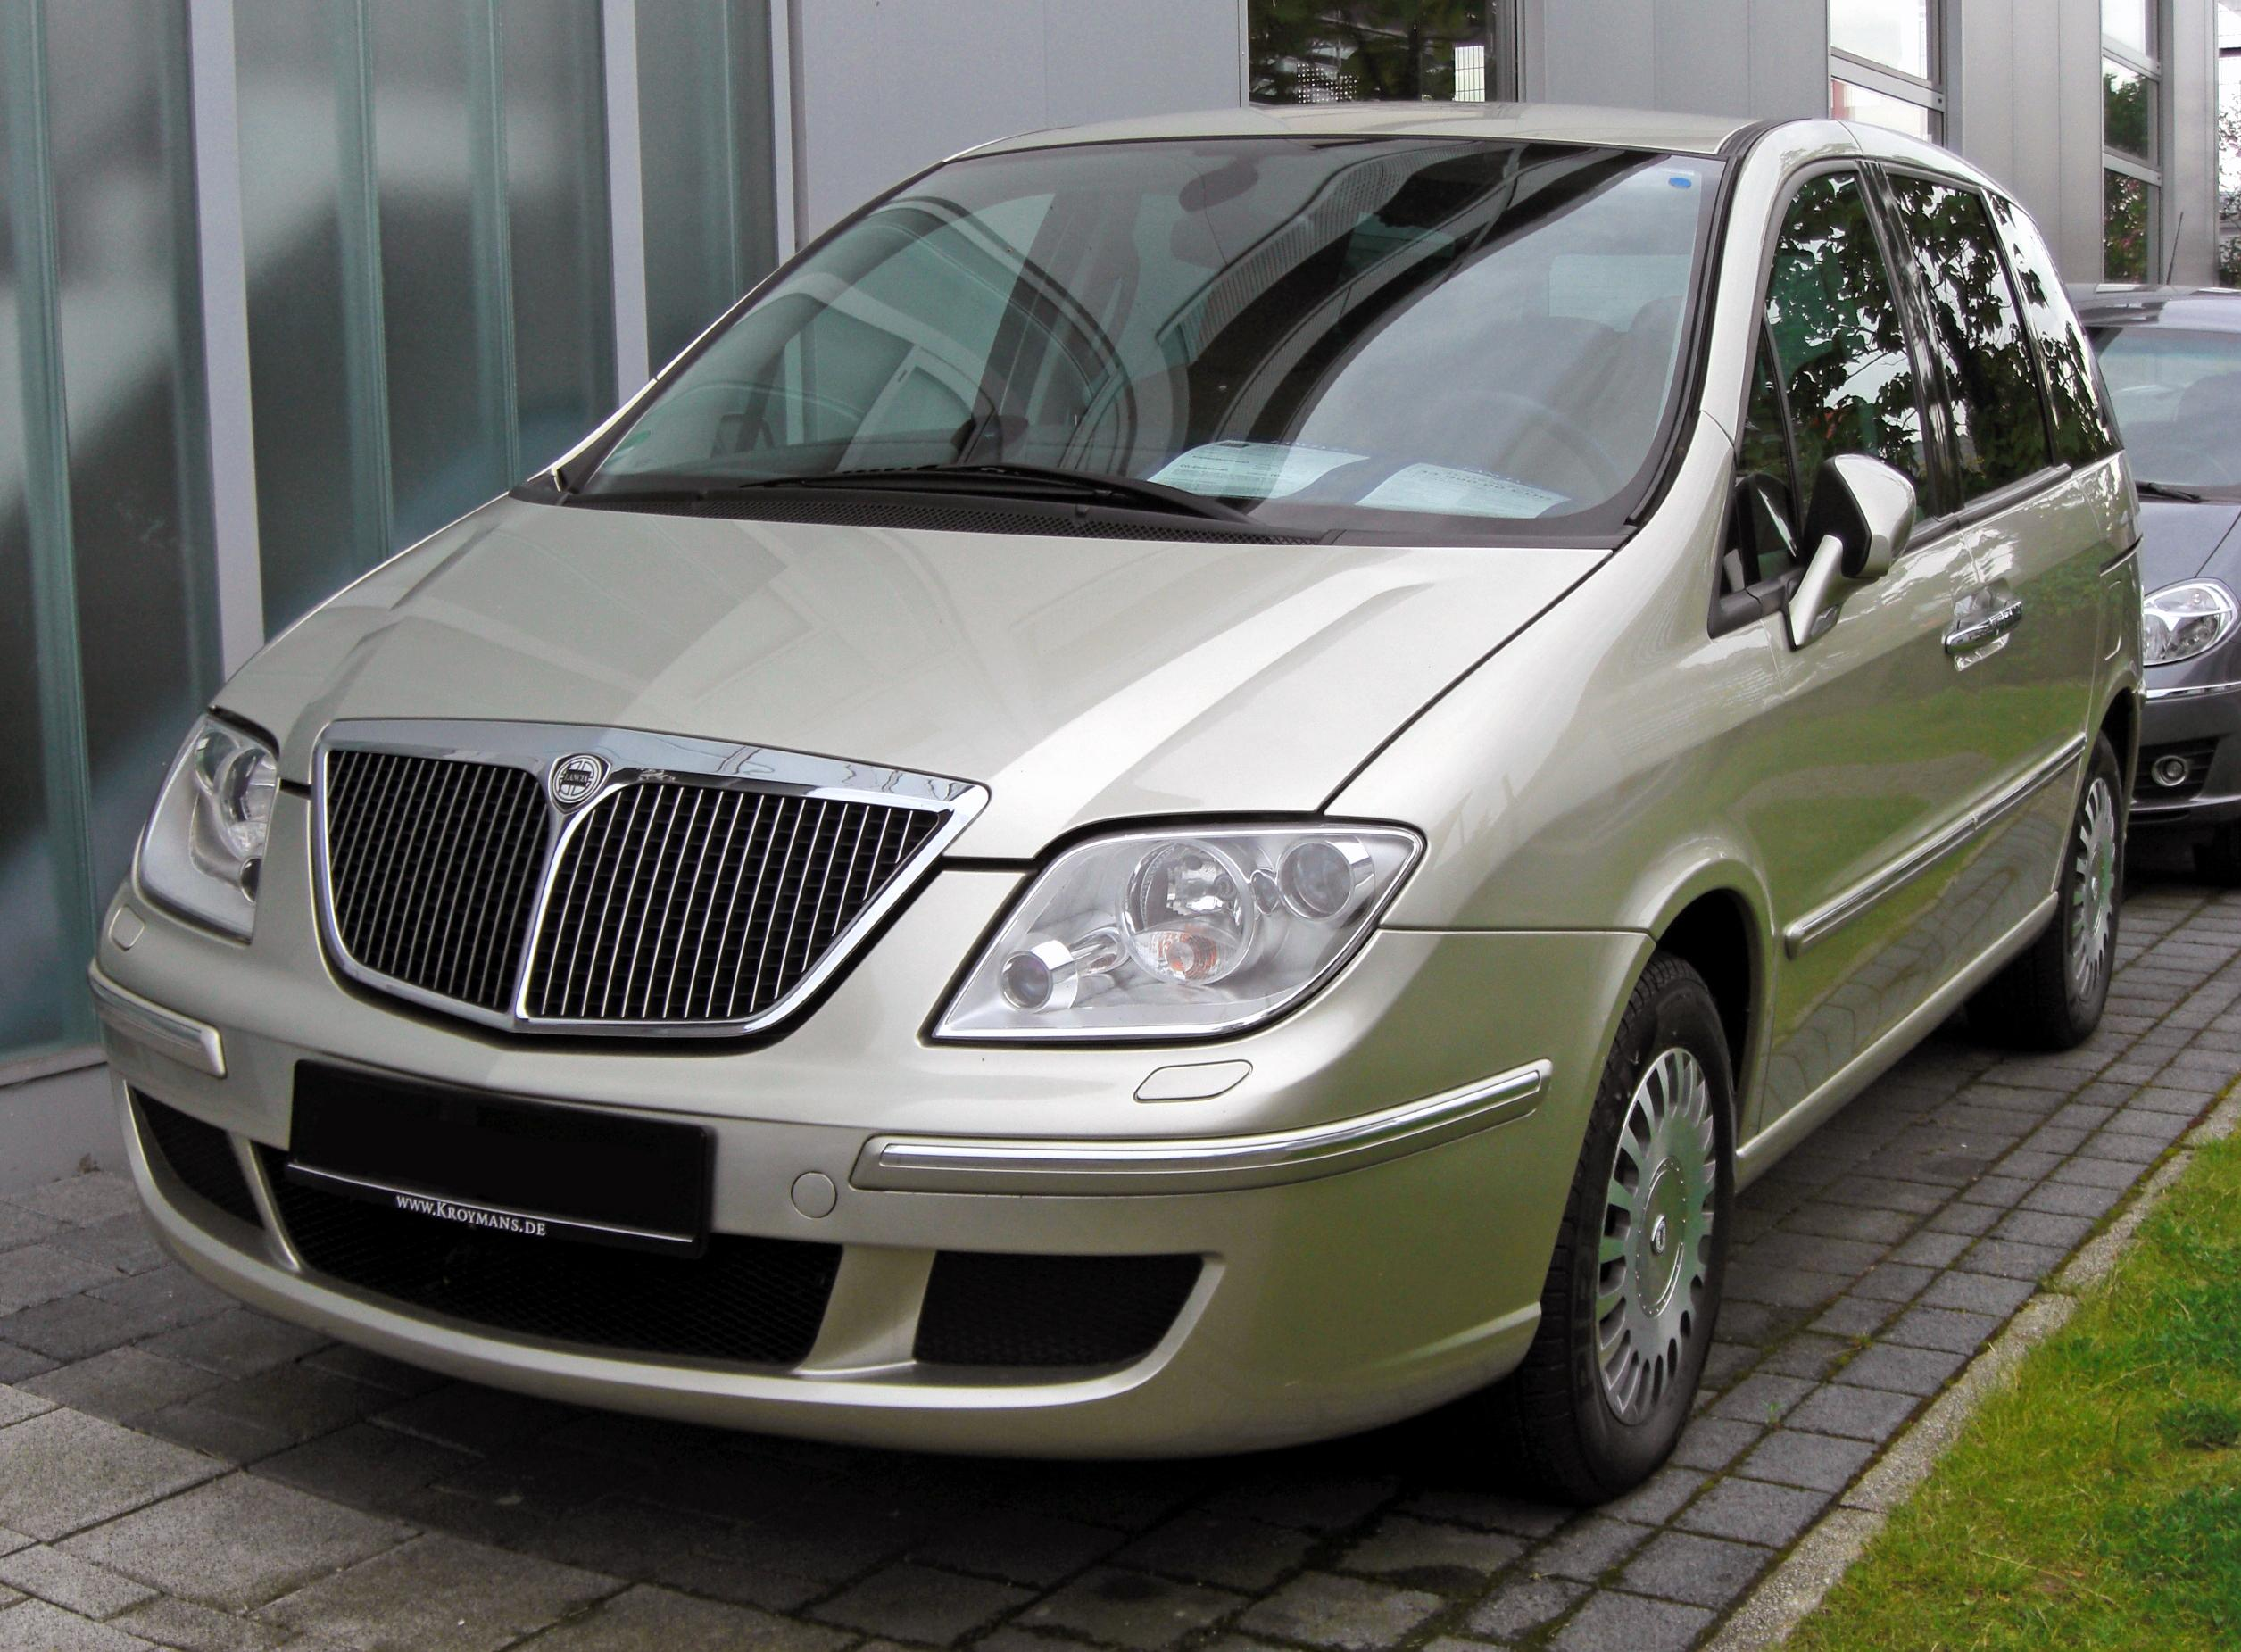 https://upload.wikimedia.org/wikipedia/commons/8/83/Lancia_Phedra_II_20090620_front.JPG